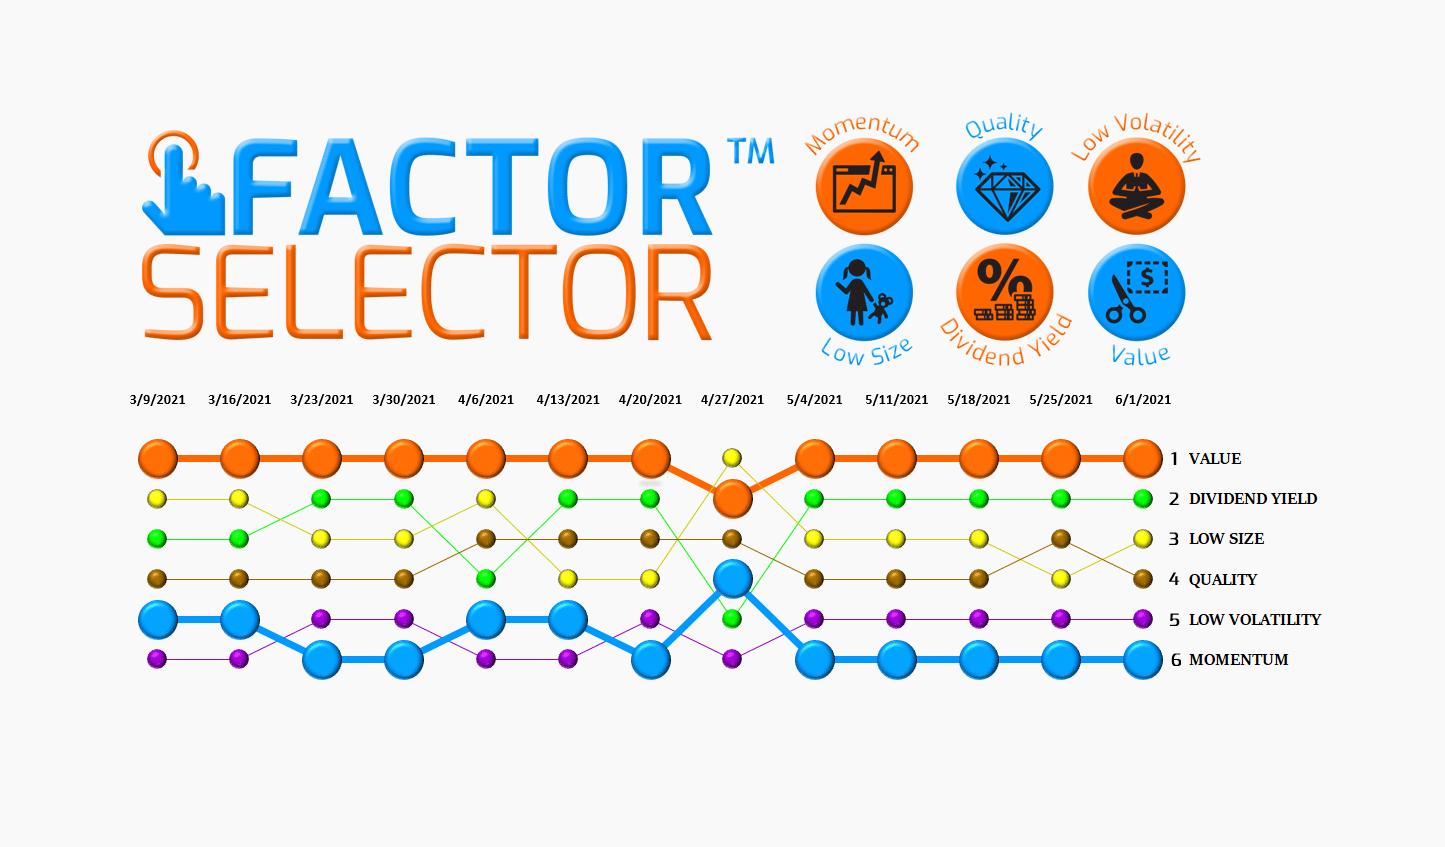 Factor Selector™  – 06/02/21 via @https://www.pinterest.com/market_scholars